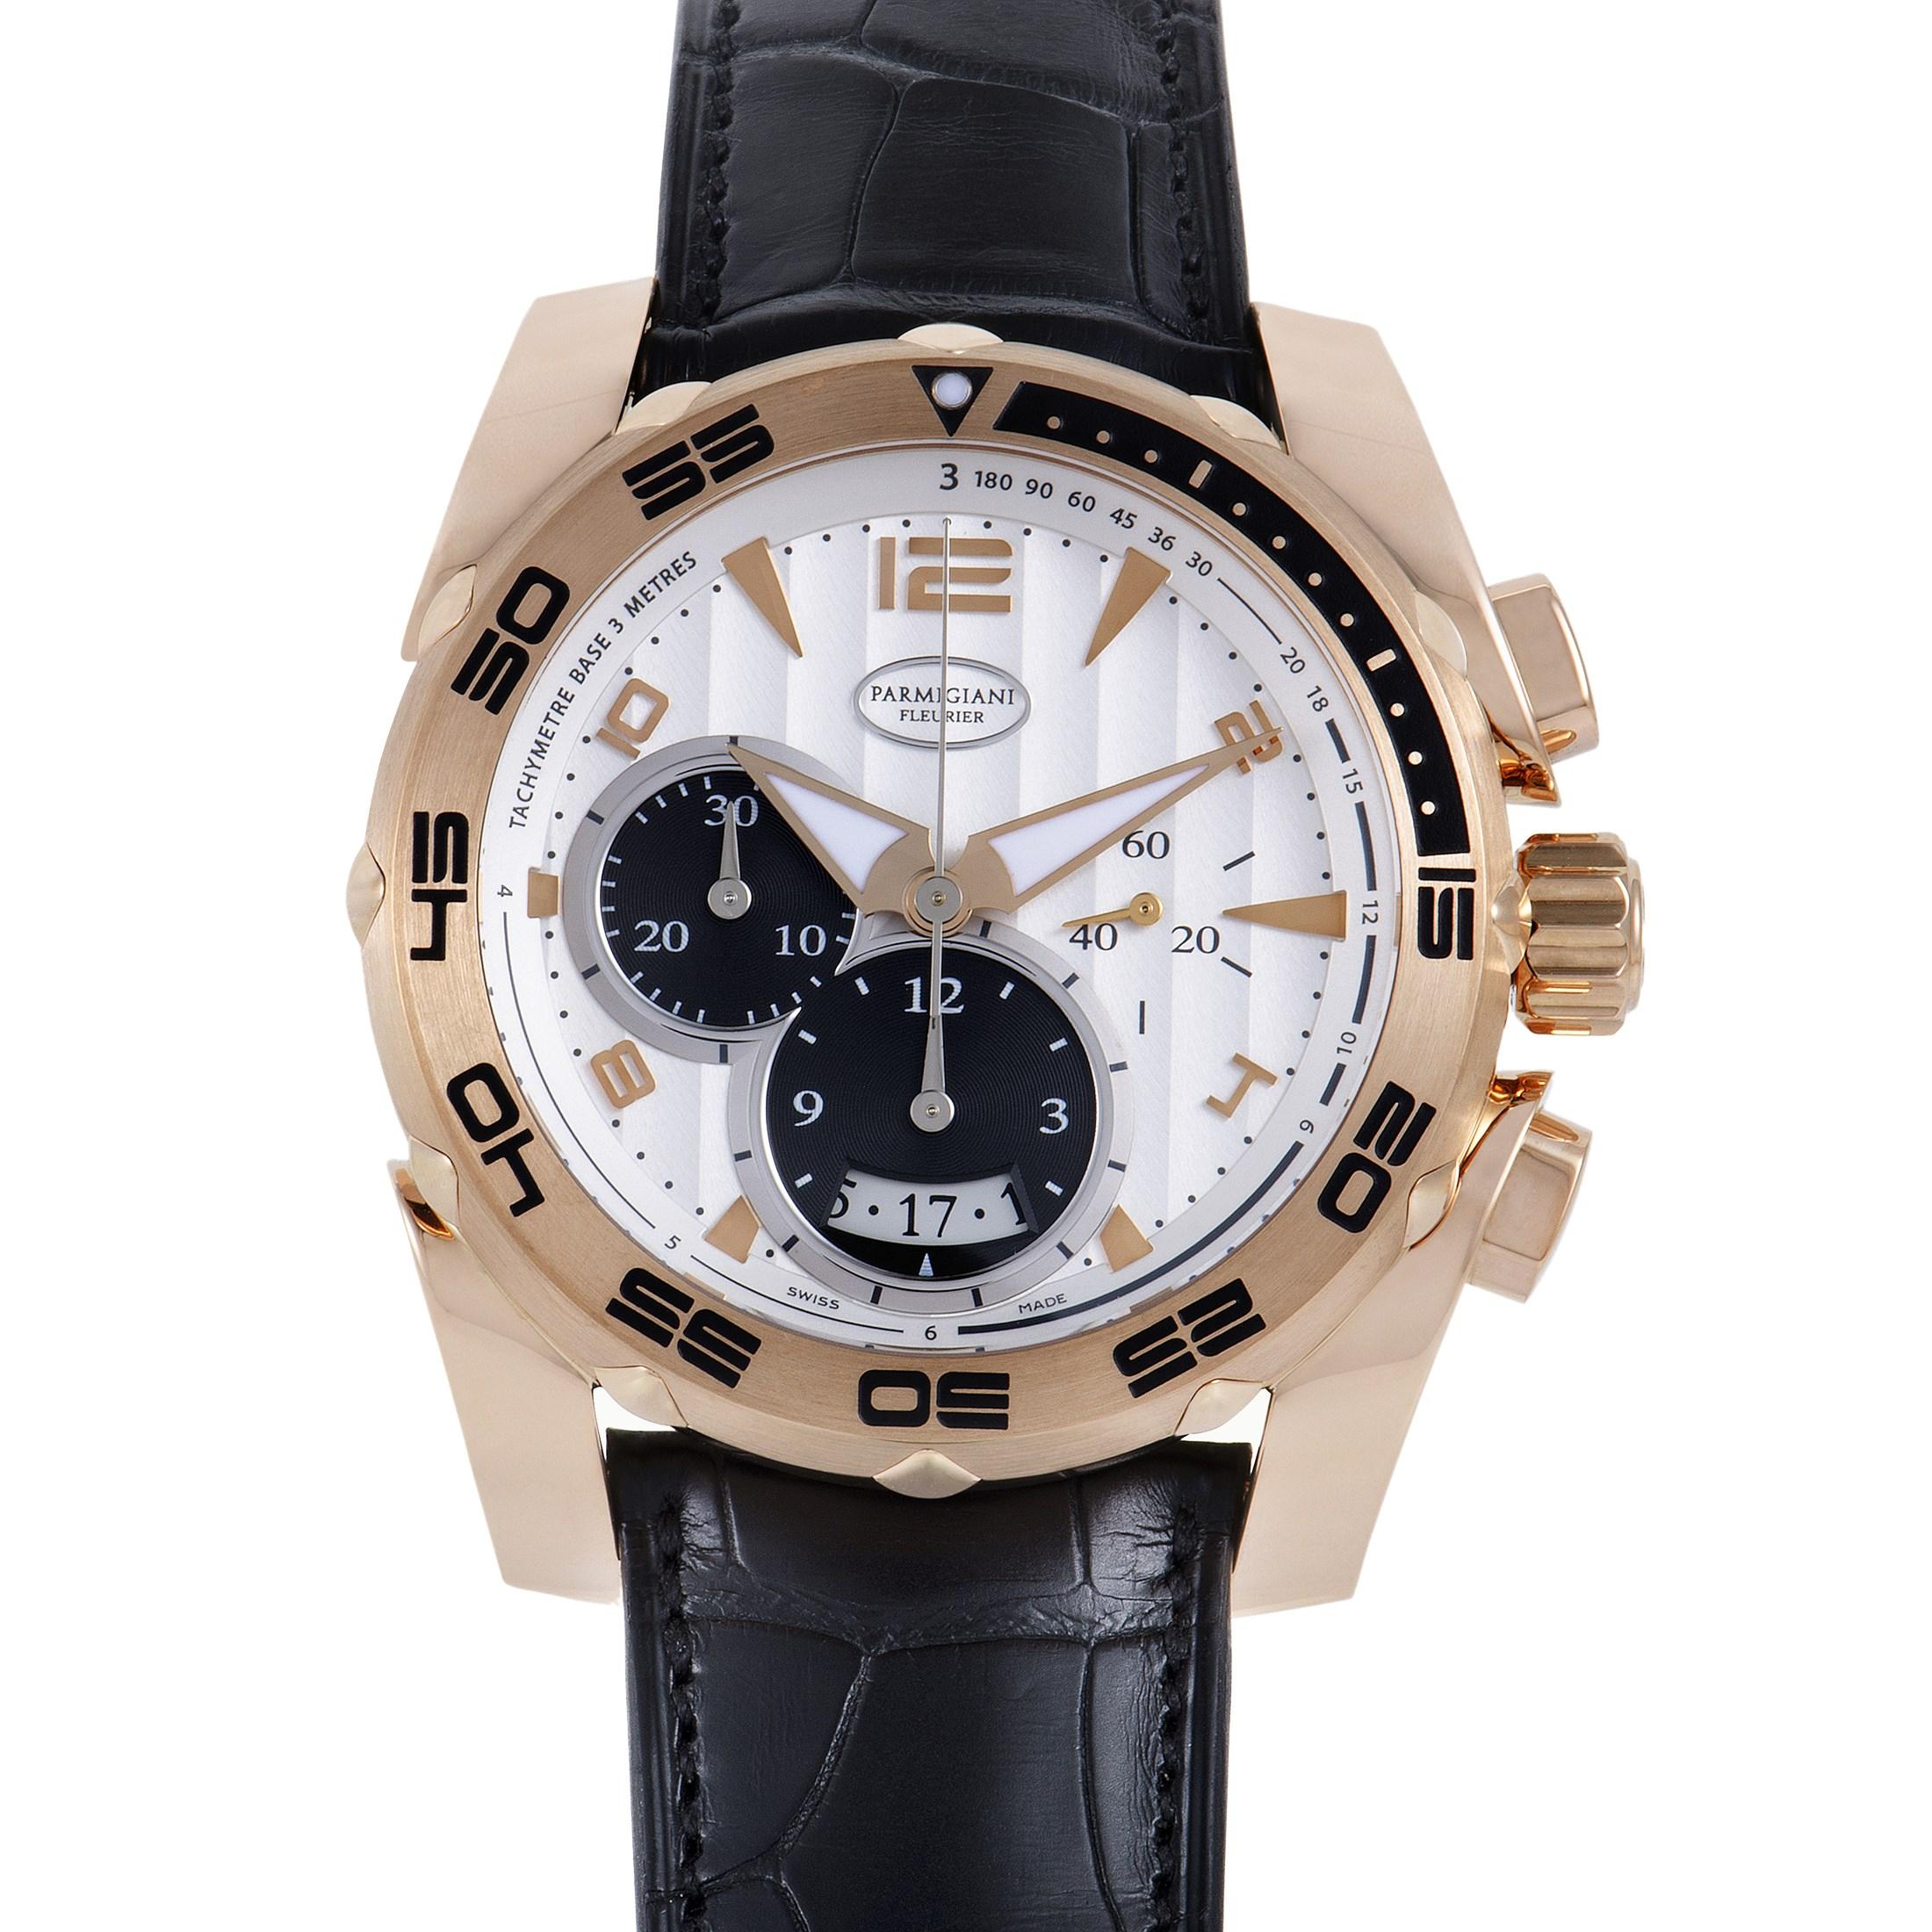 Pershing 005 Chronograph Watch PFC528-1010101-HA1442